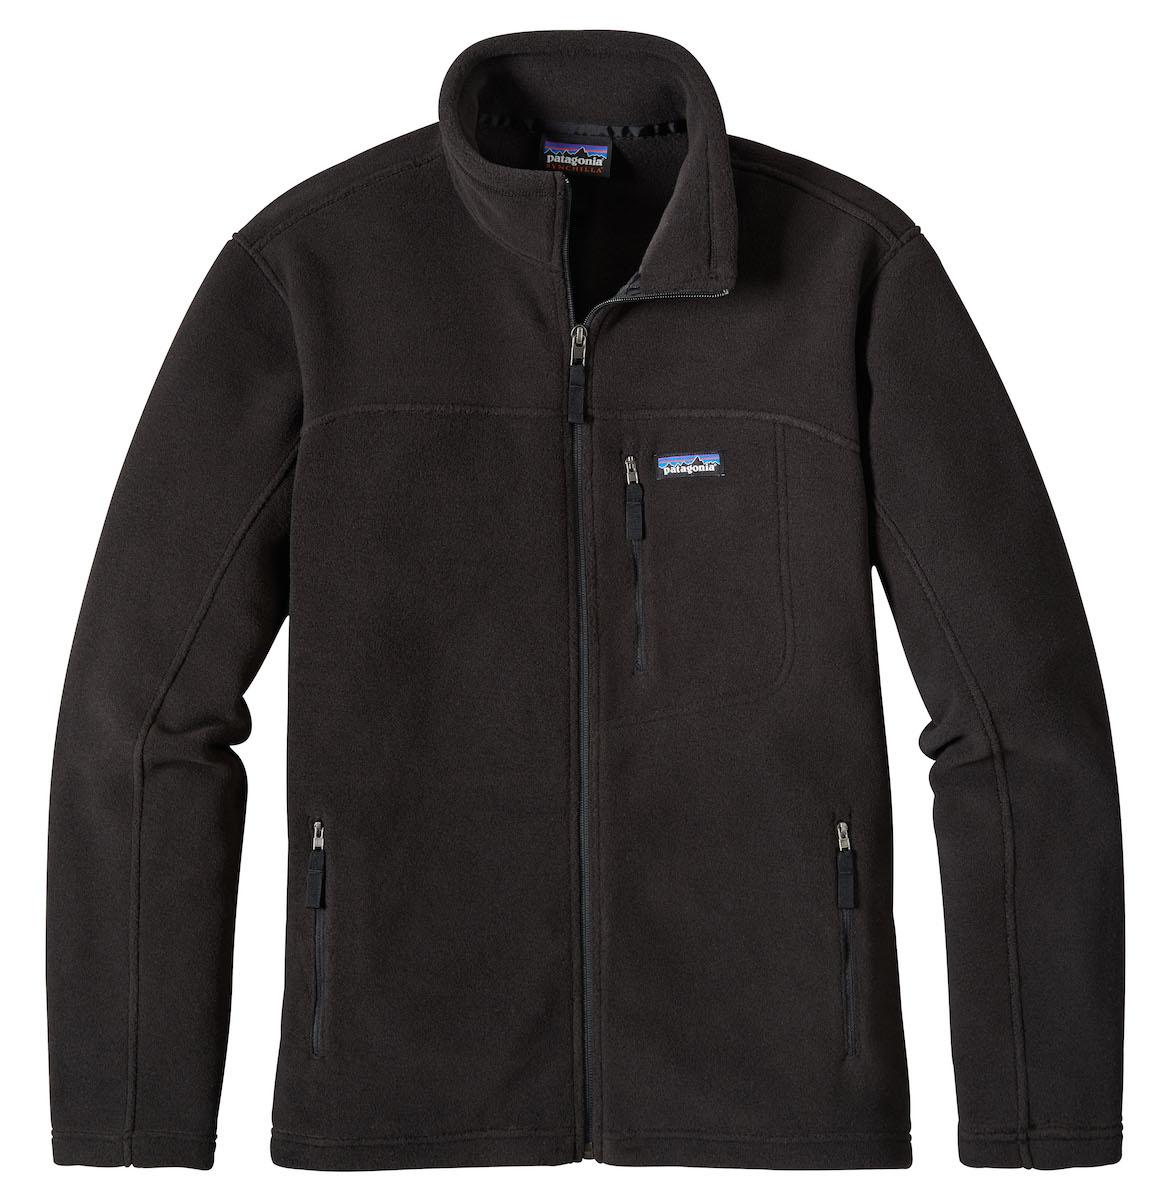 Patagonia - Classic Synchilla® Fleece Jacket - Forro polar - Hombre